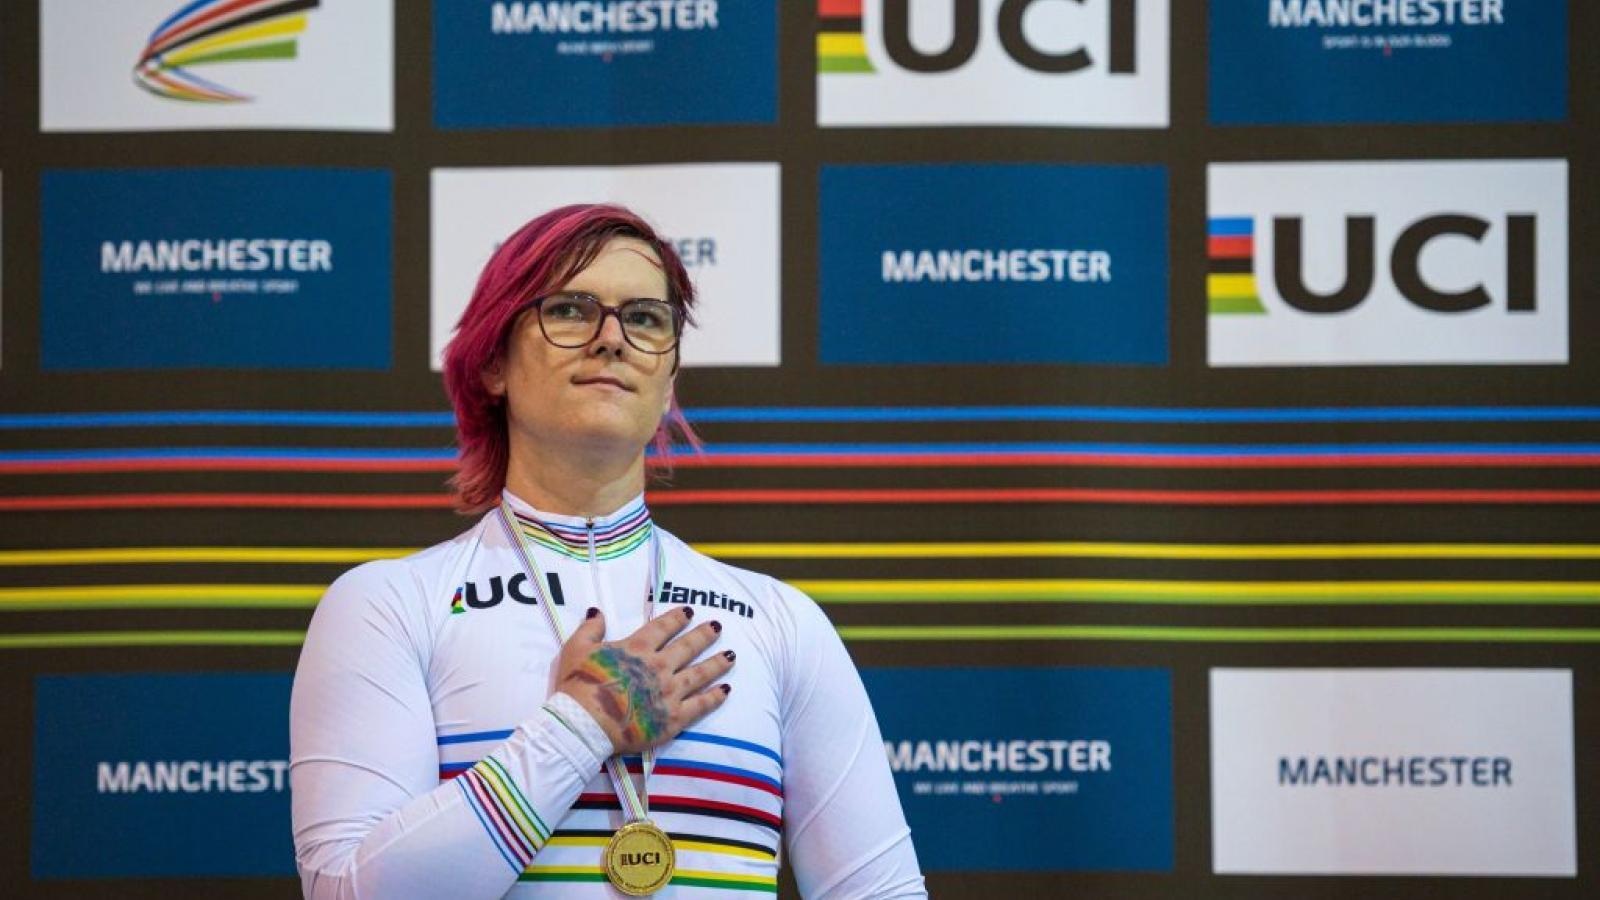 Women's cycling world champion Veronica Ivy